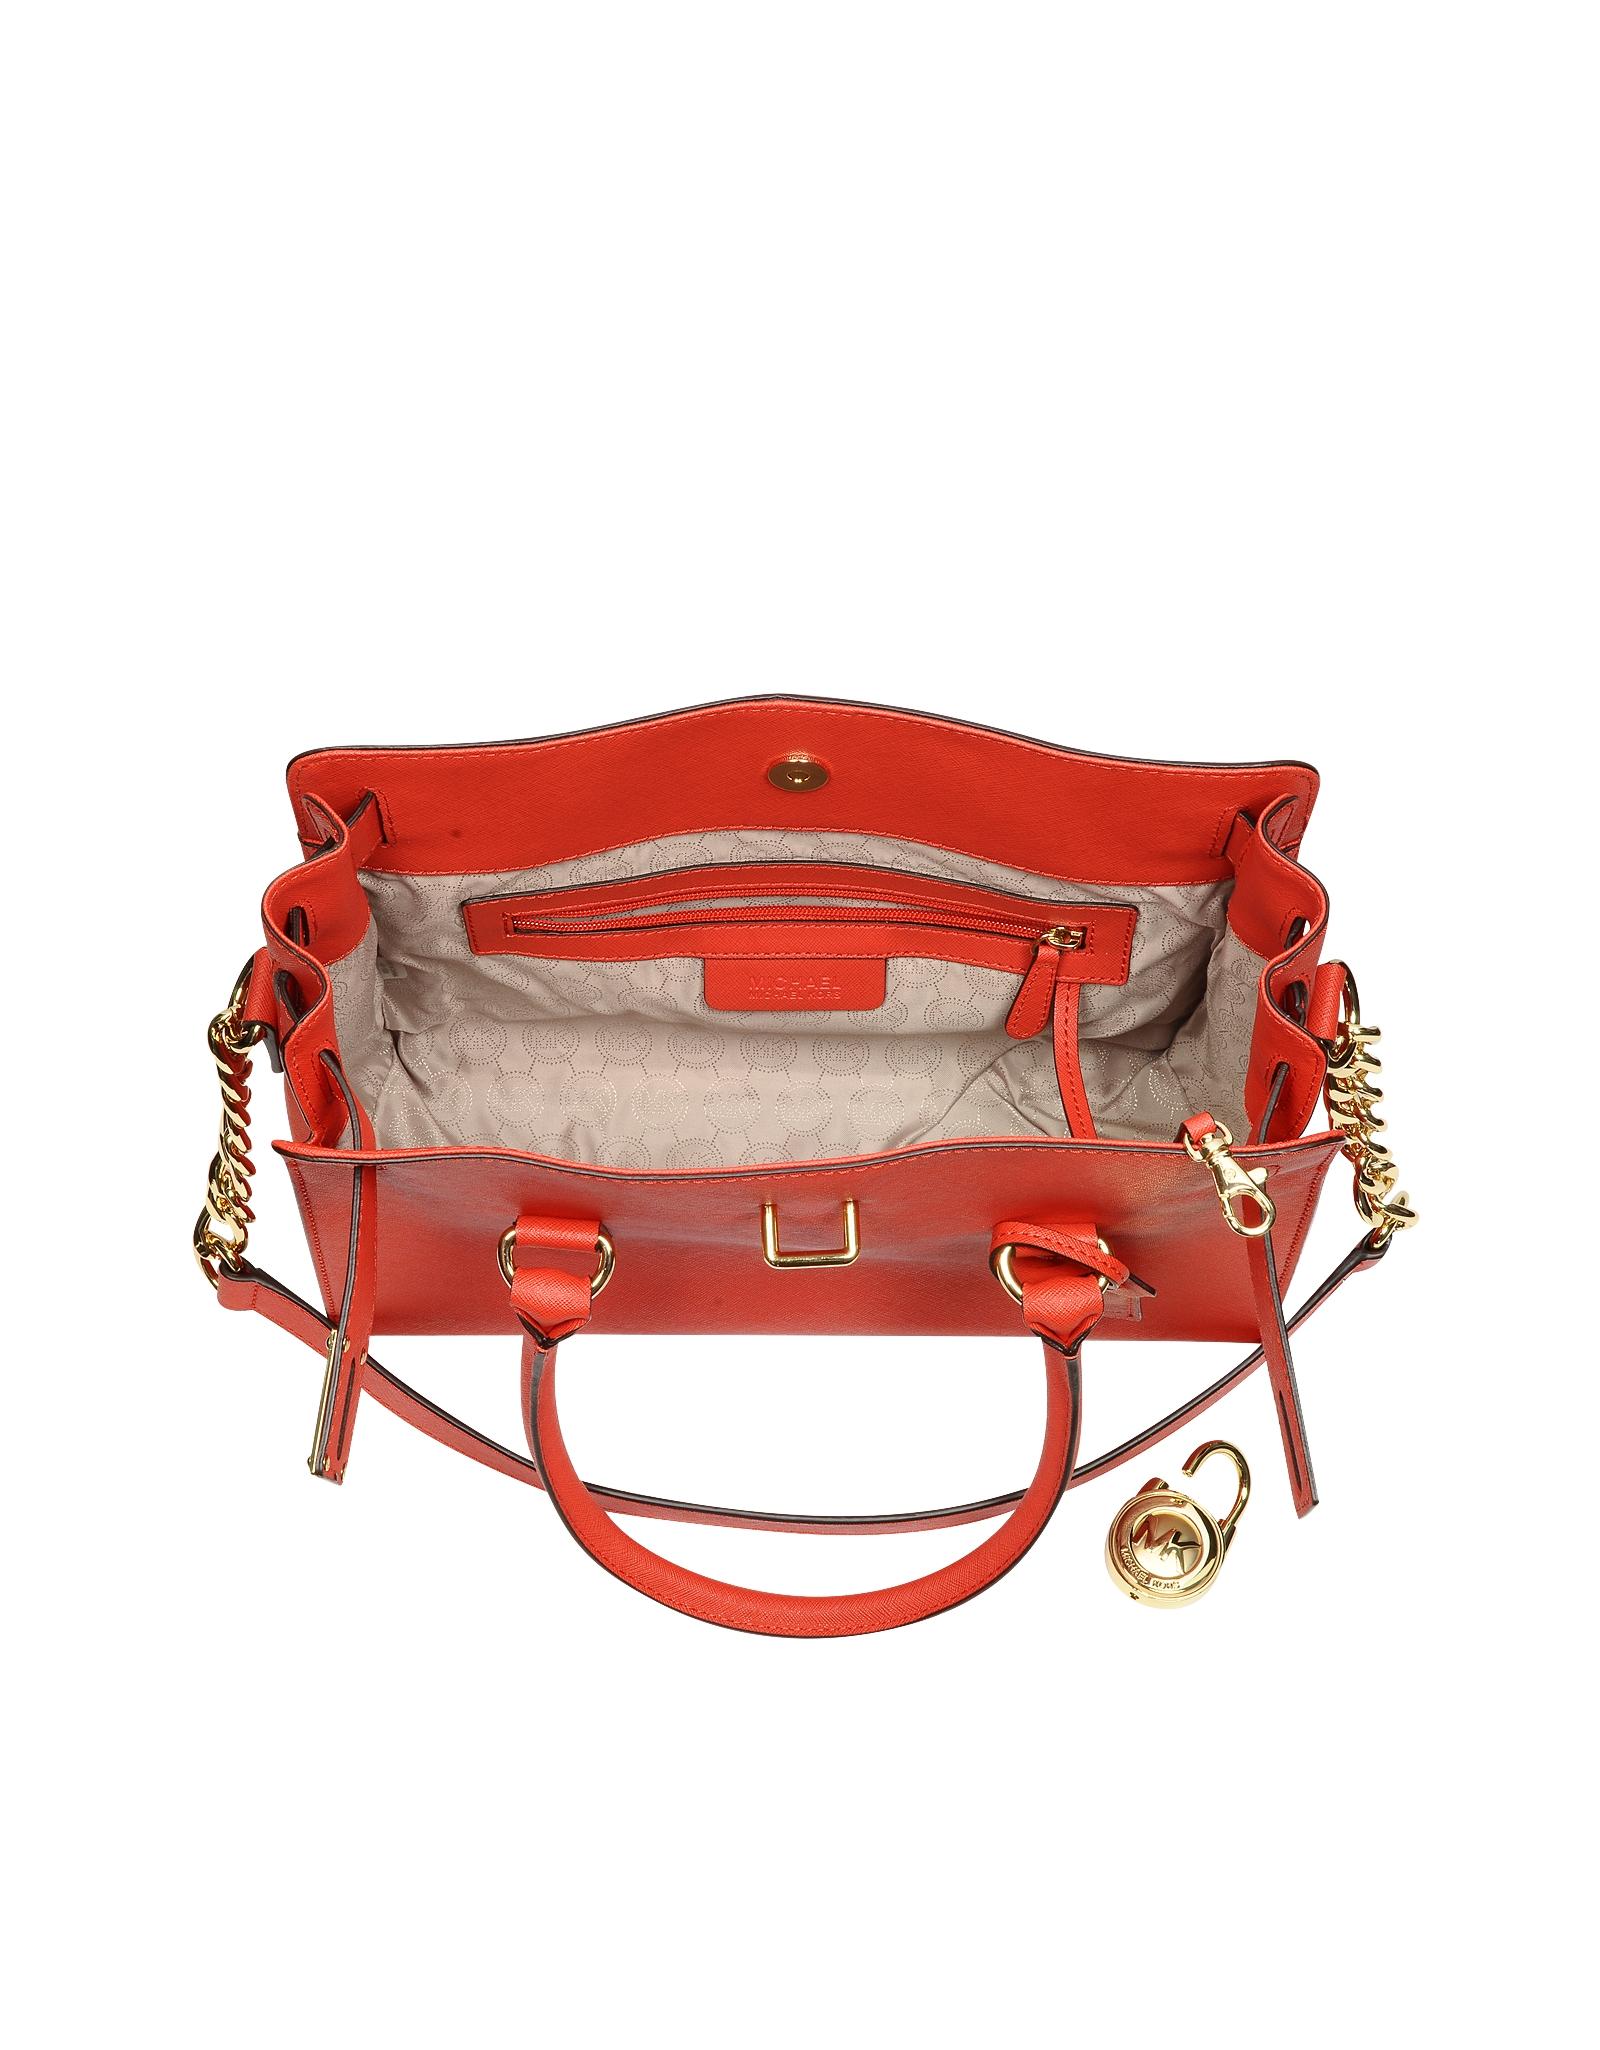 ce4e9496020a Michael Kors Hamilton Saffiano Leather Satchel in Red - Lyst